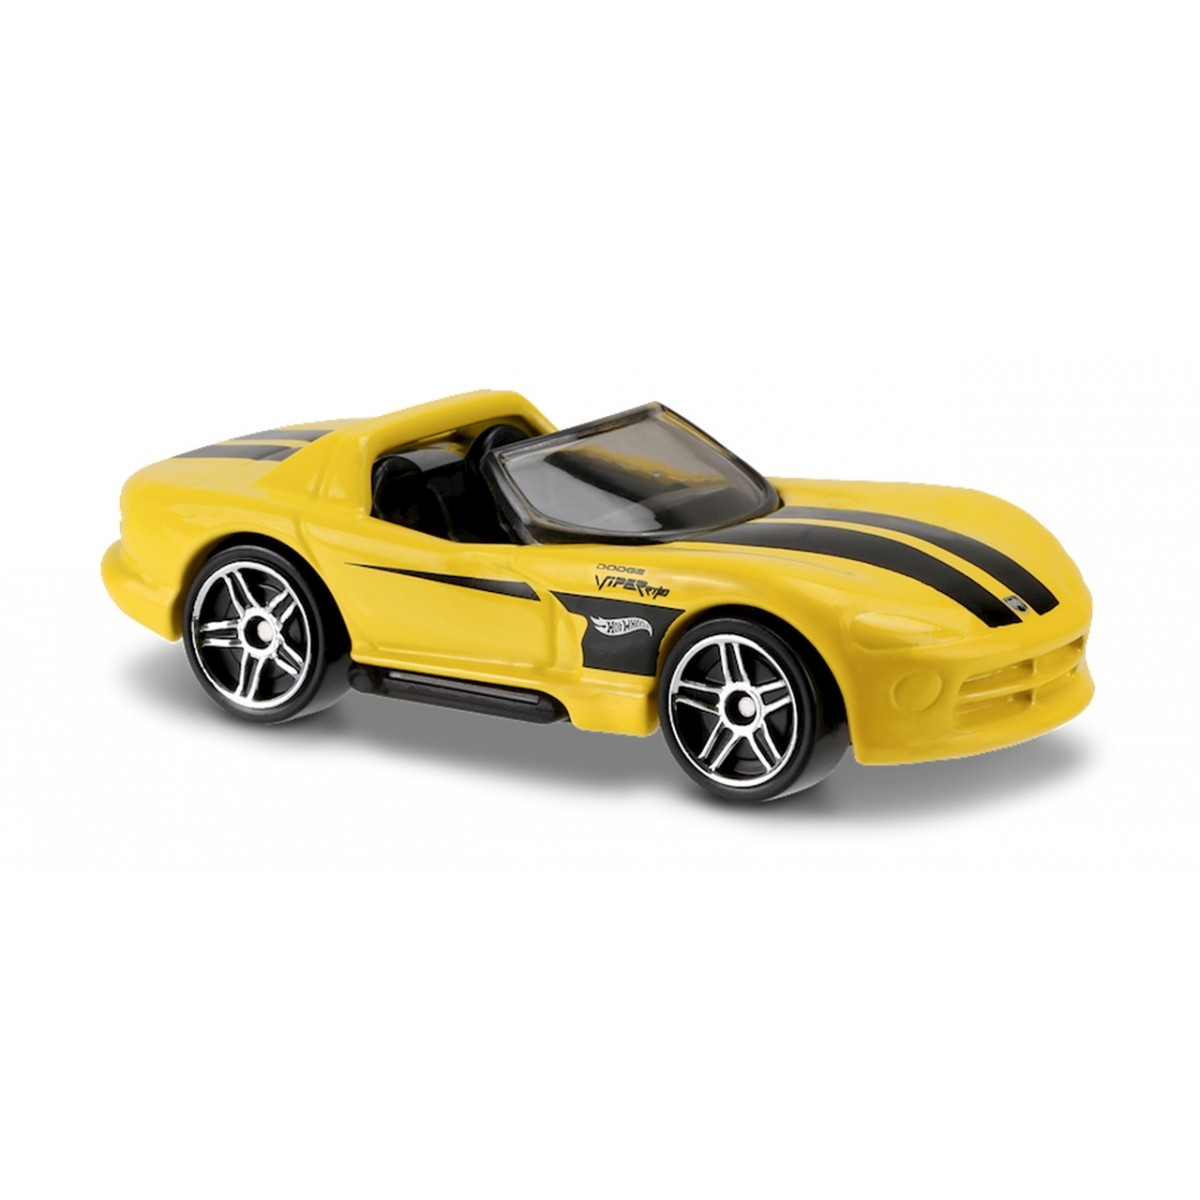 Carrinho Hot Wheels: Dodge Viper RT/10 Amarelo